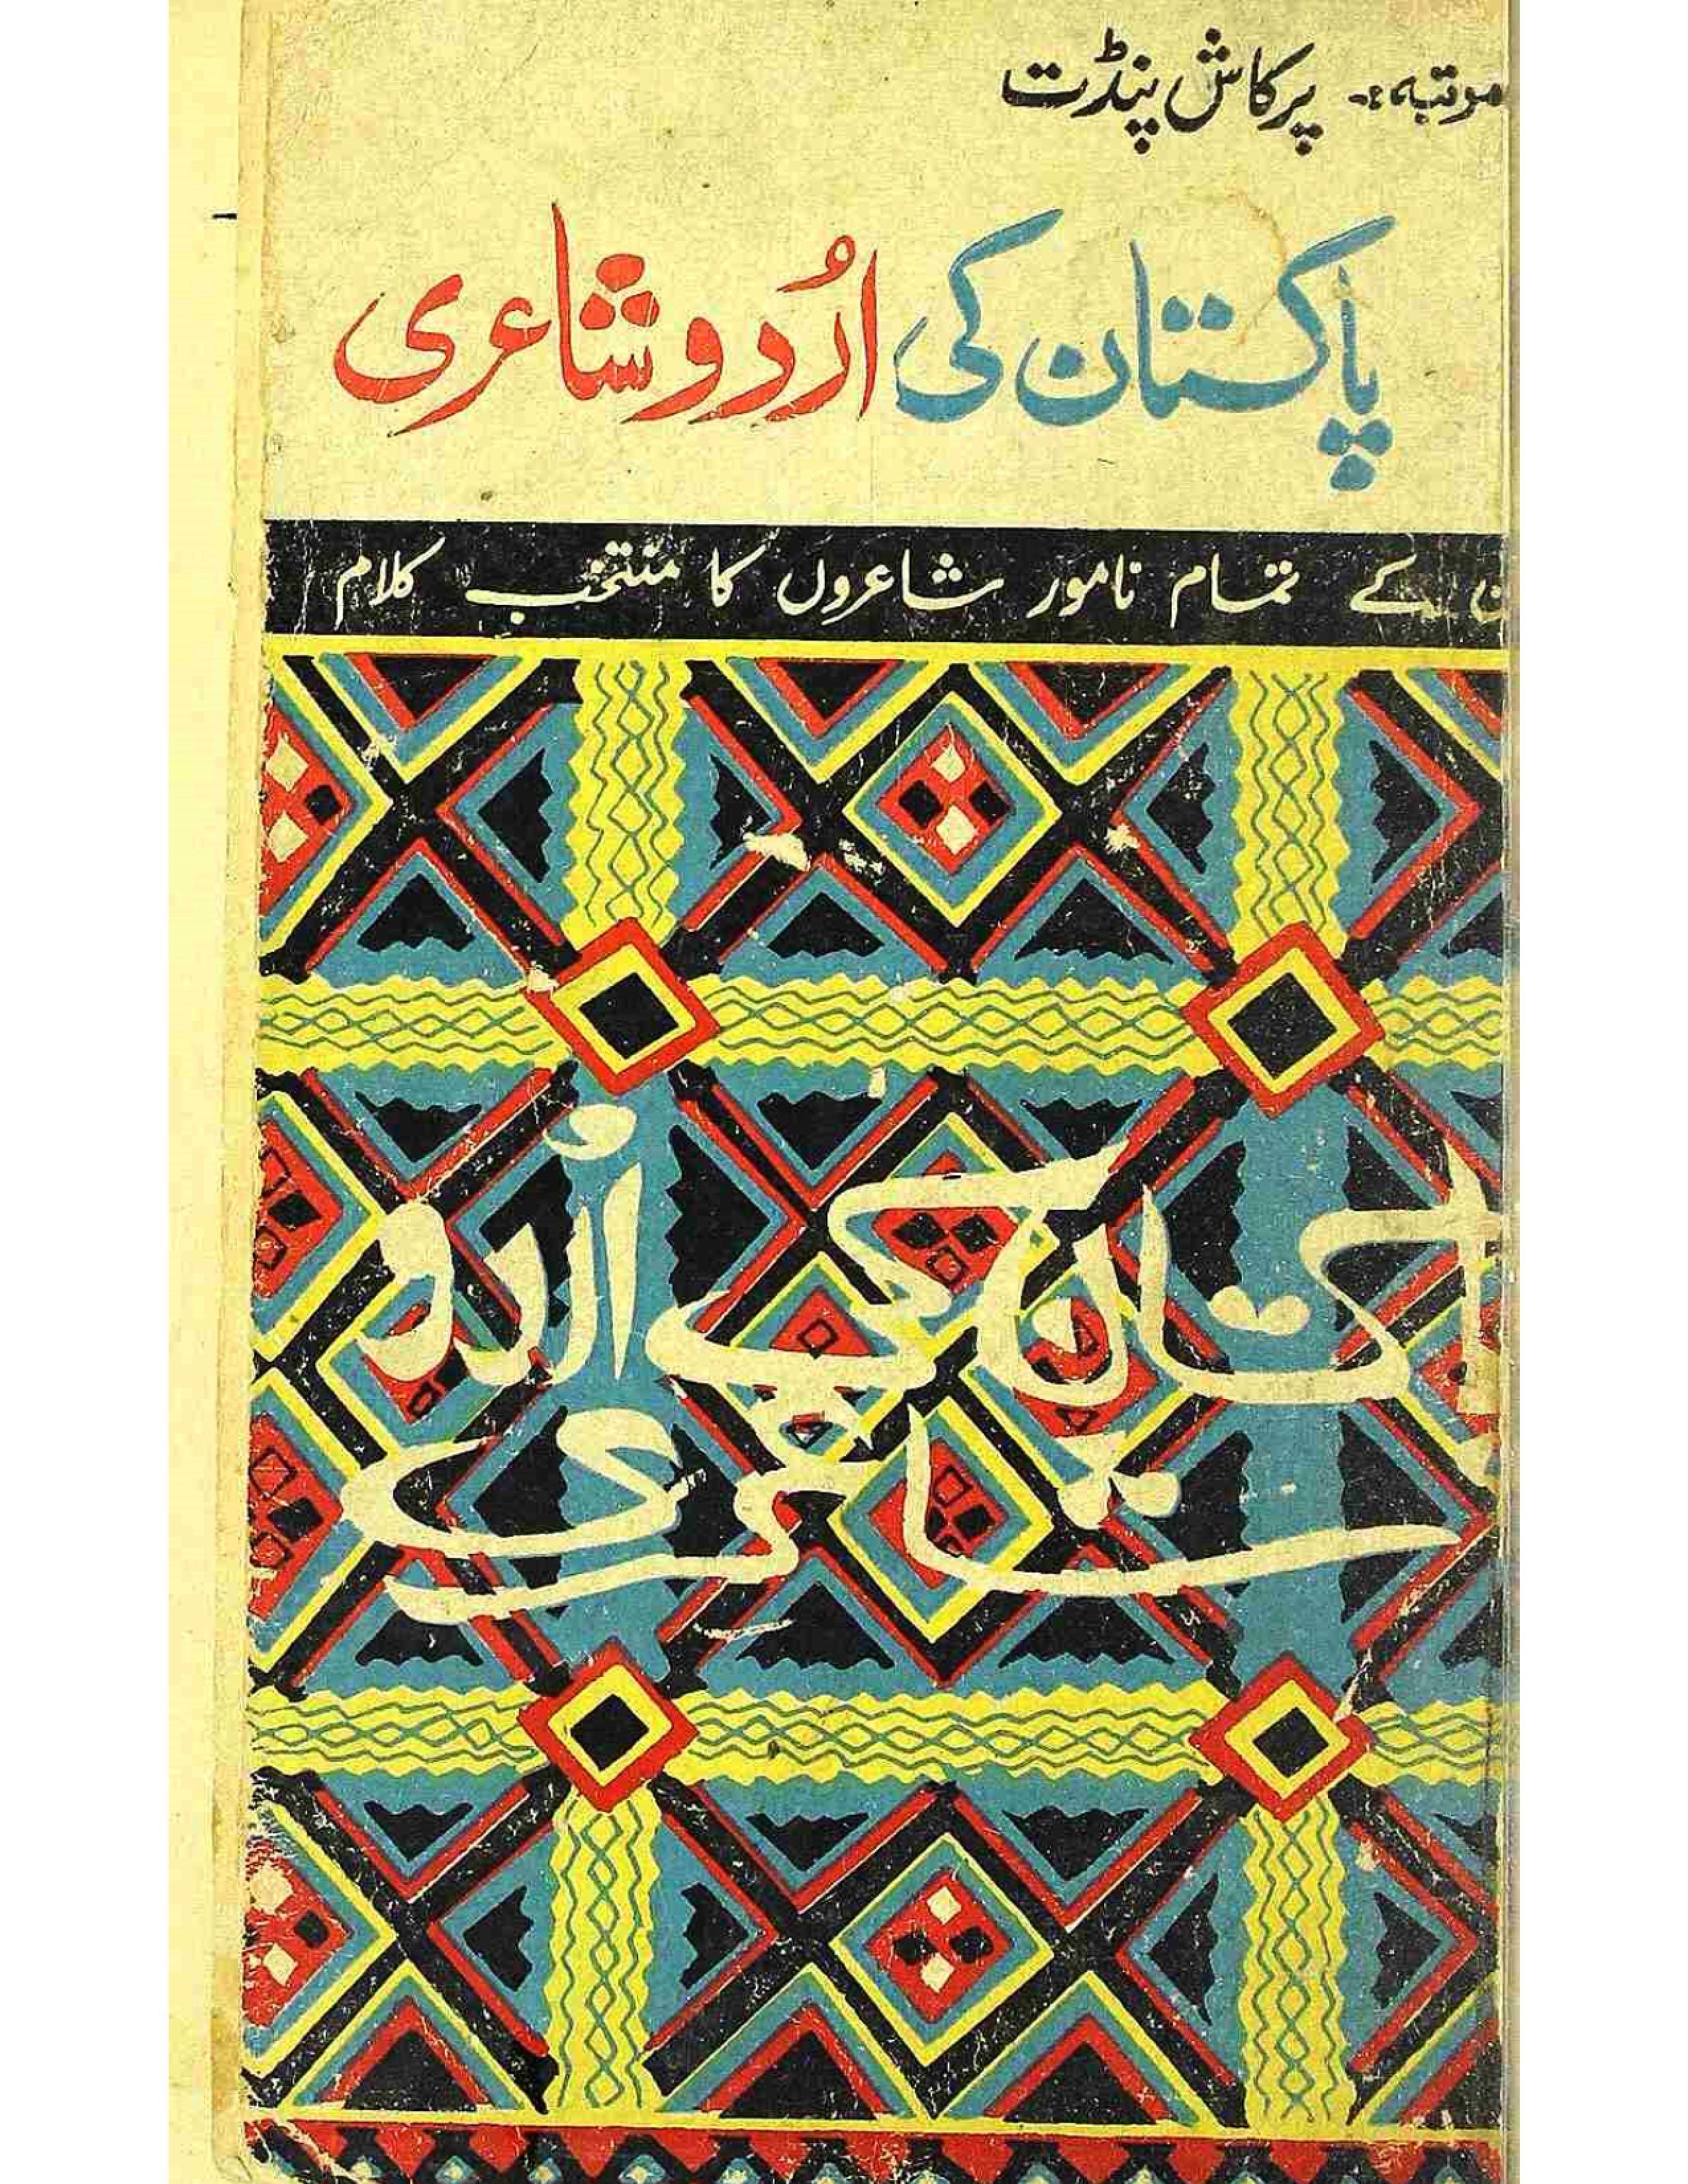 Pakistan ki Urdu Shayari